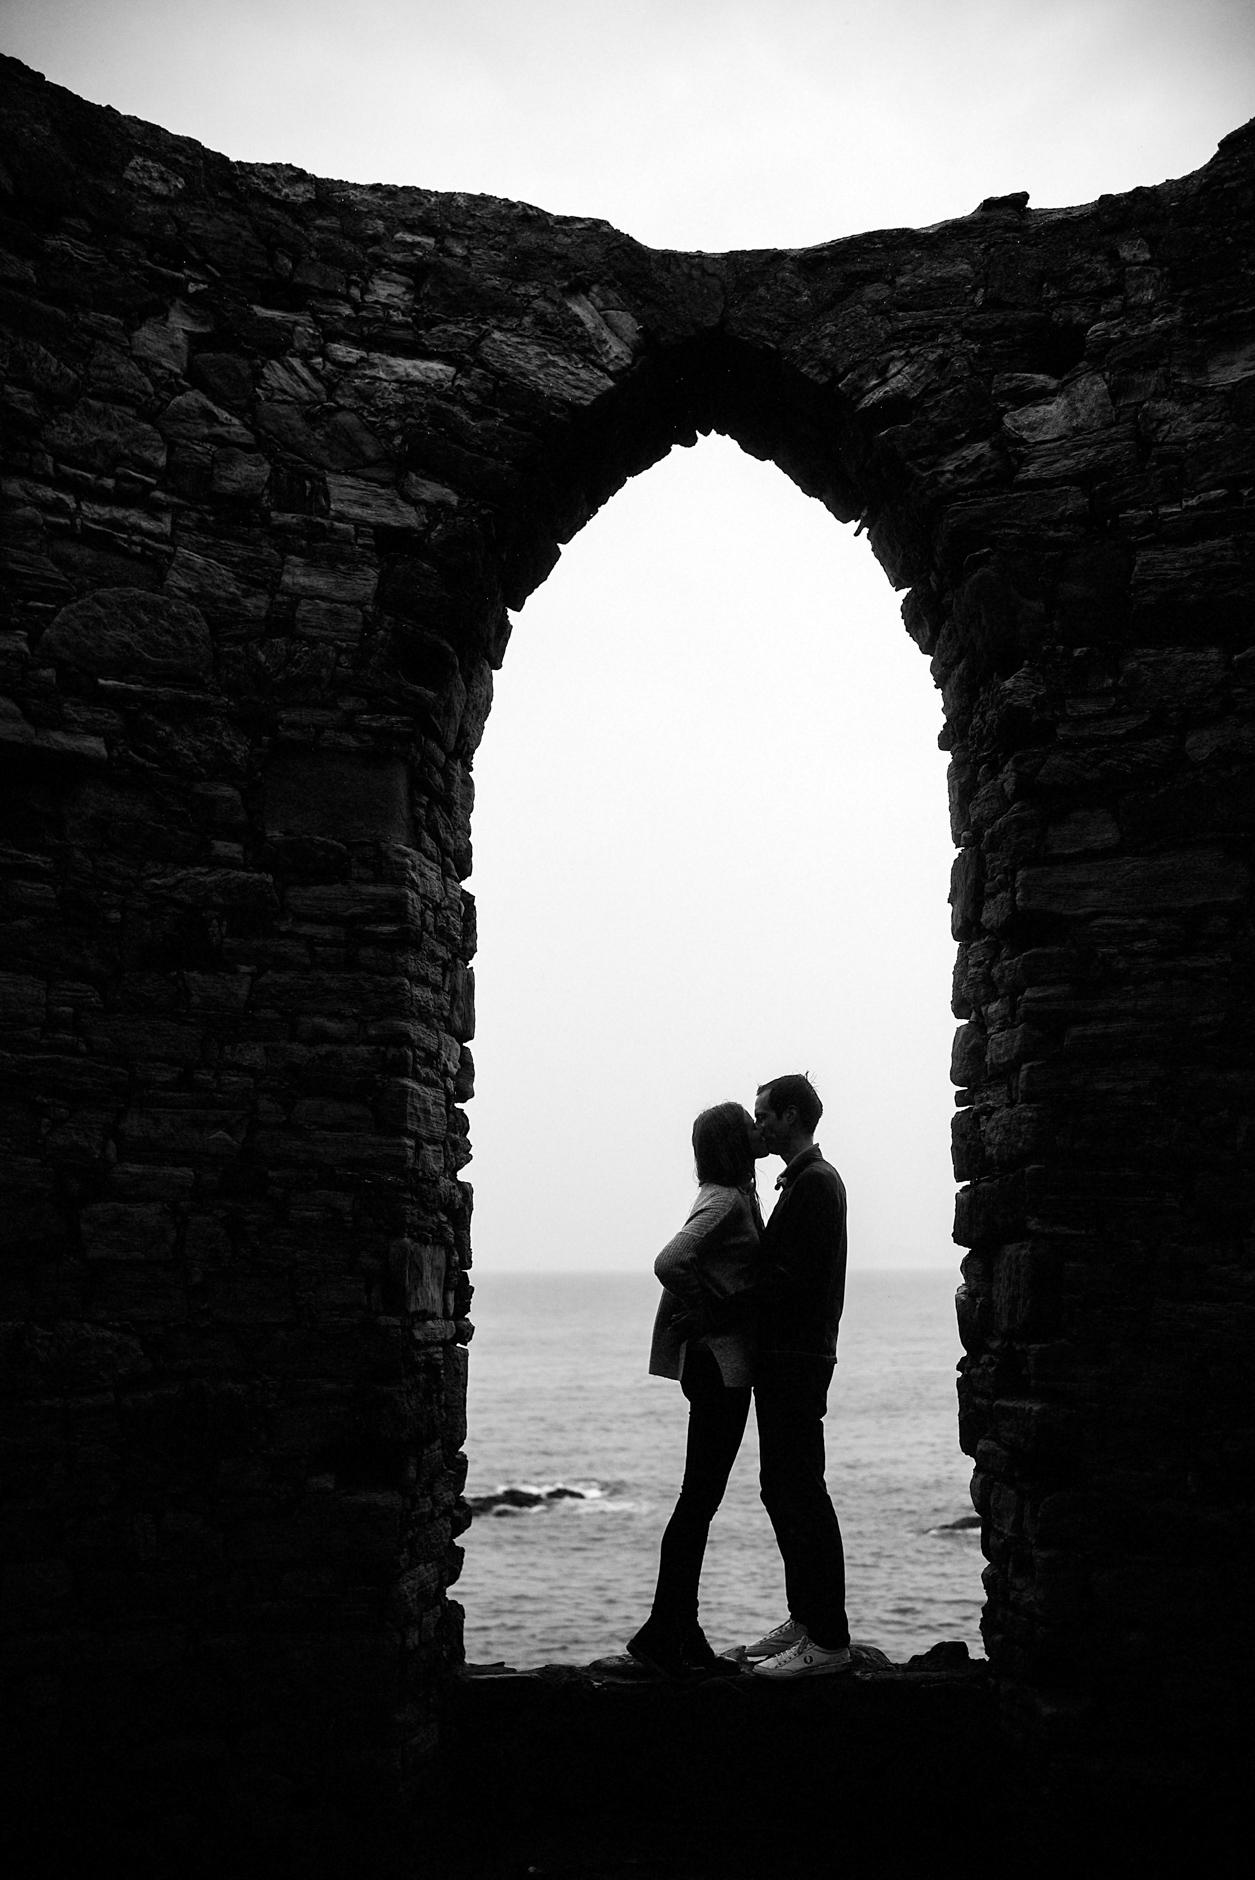 Elie_Wedding_Photographer_Alternative_Nikki_Leadbetter_Photography-96.jpg